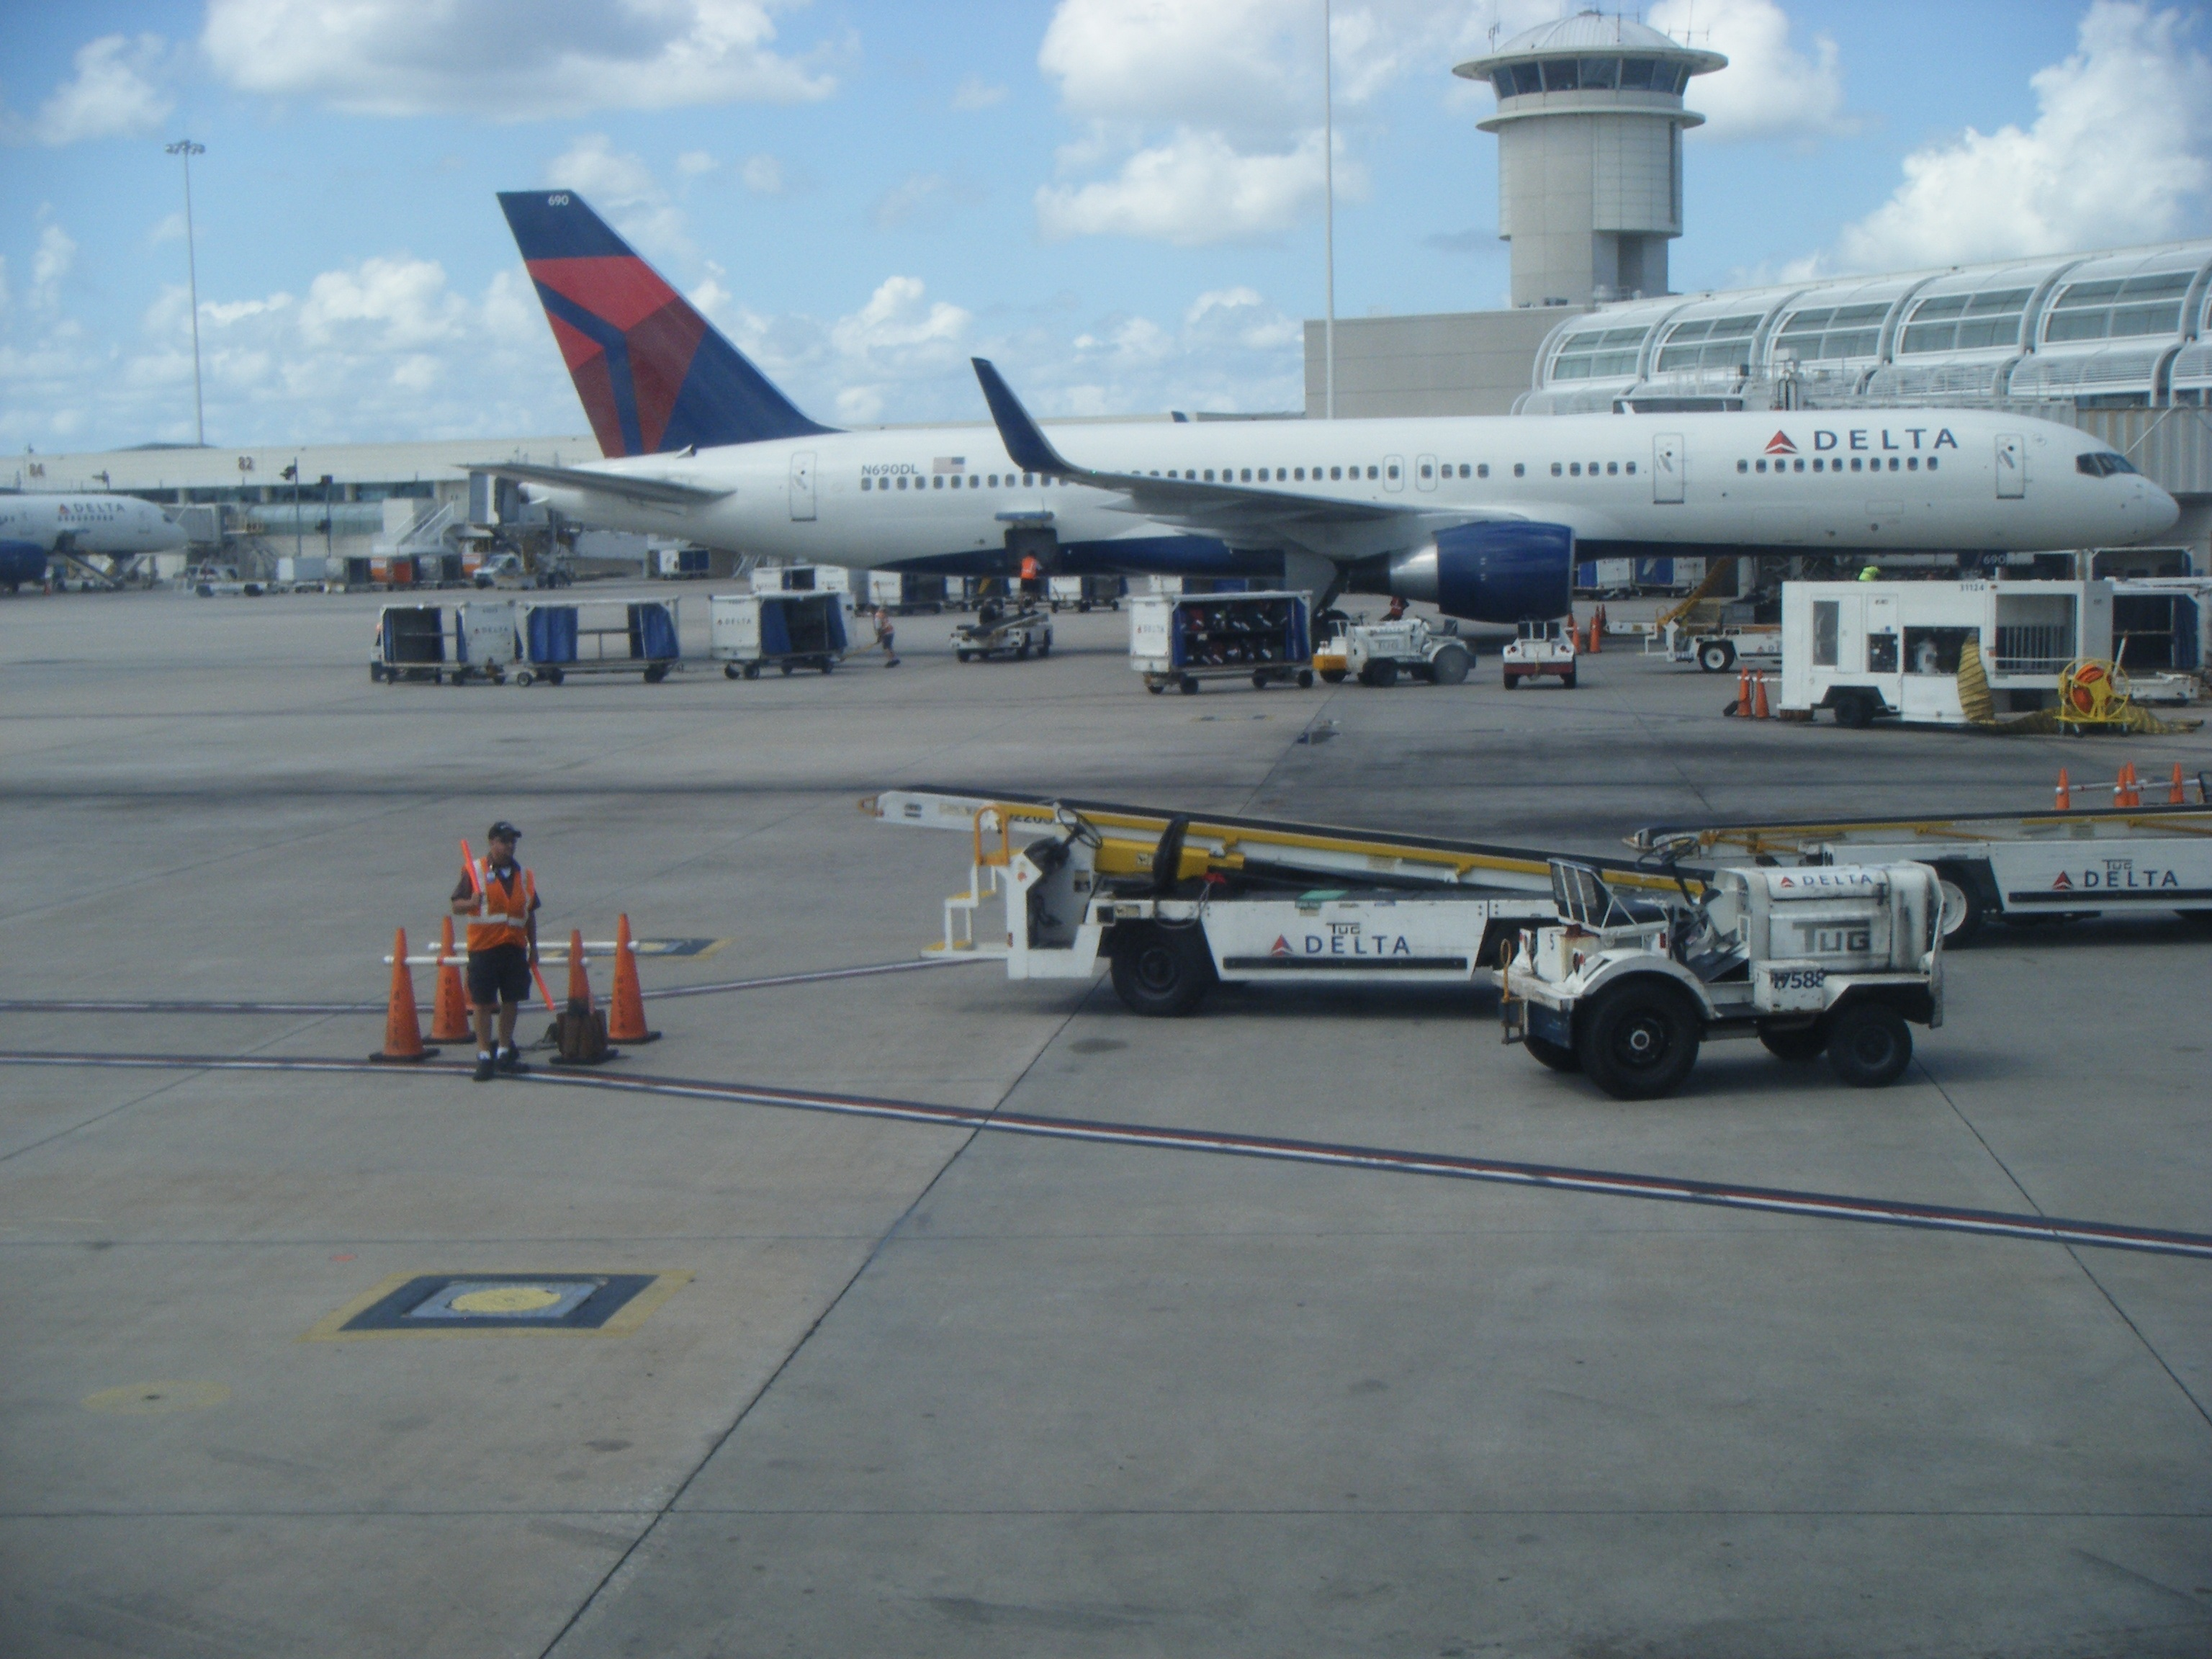 Delta_airplanes_at_Orlando_International_Airport.jpg